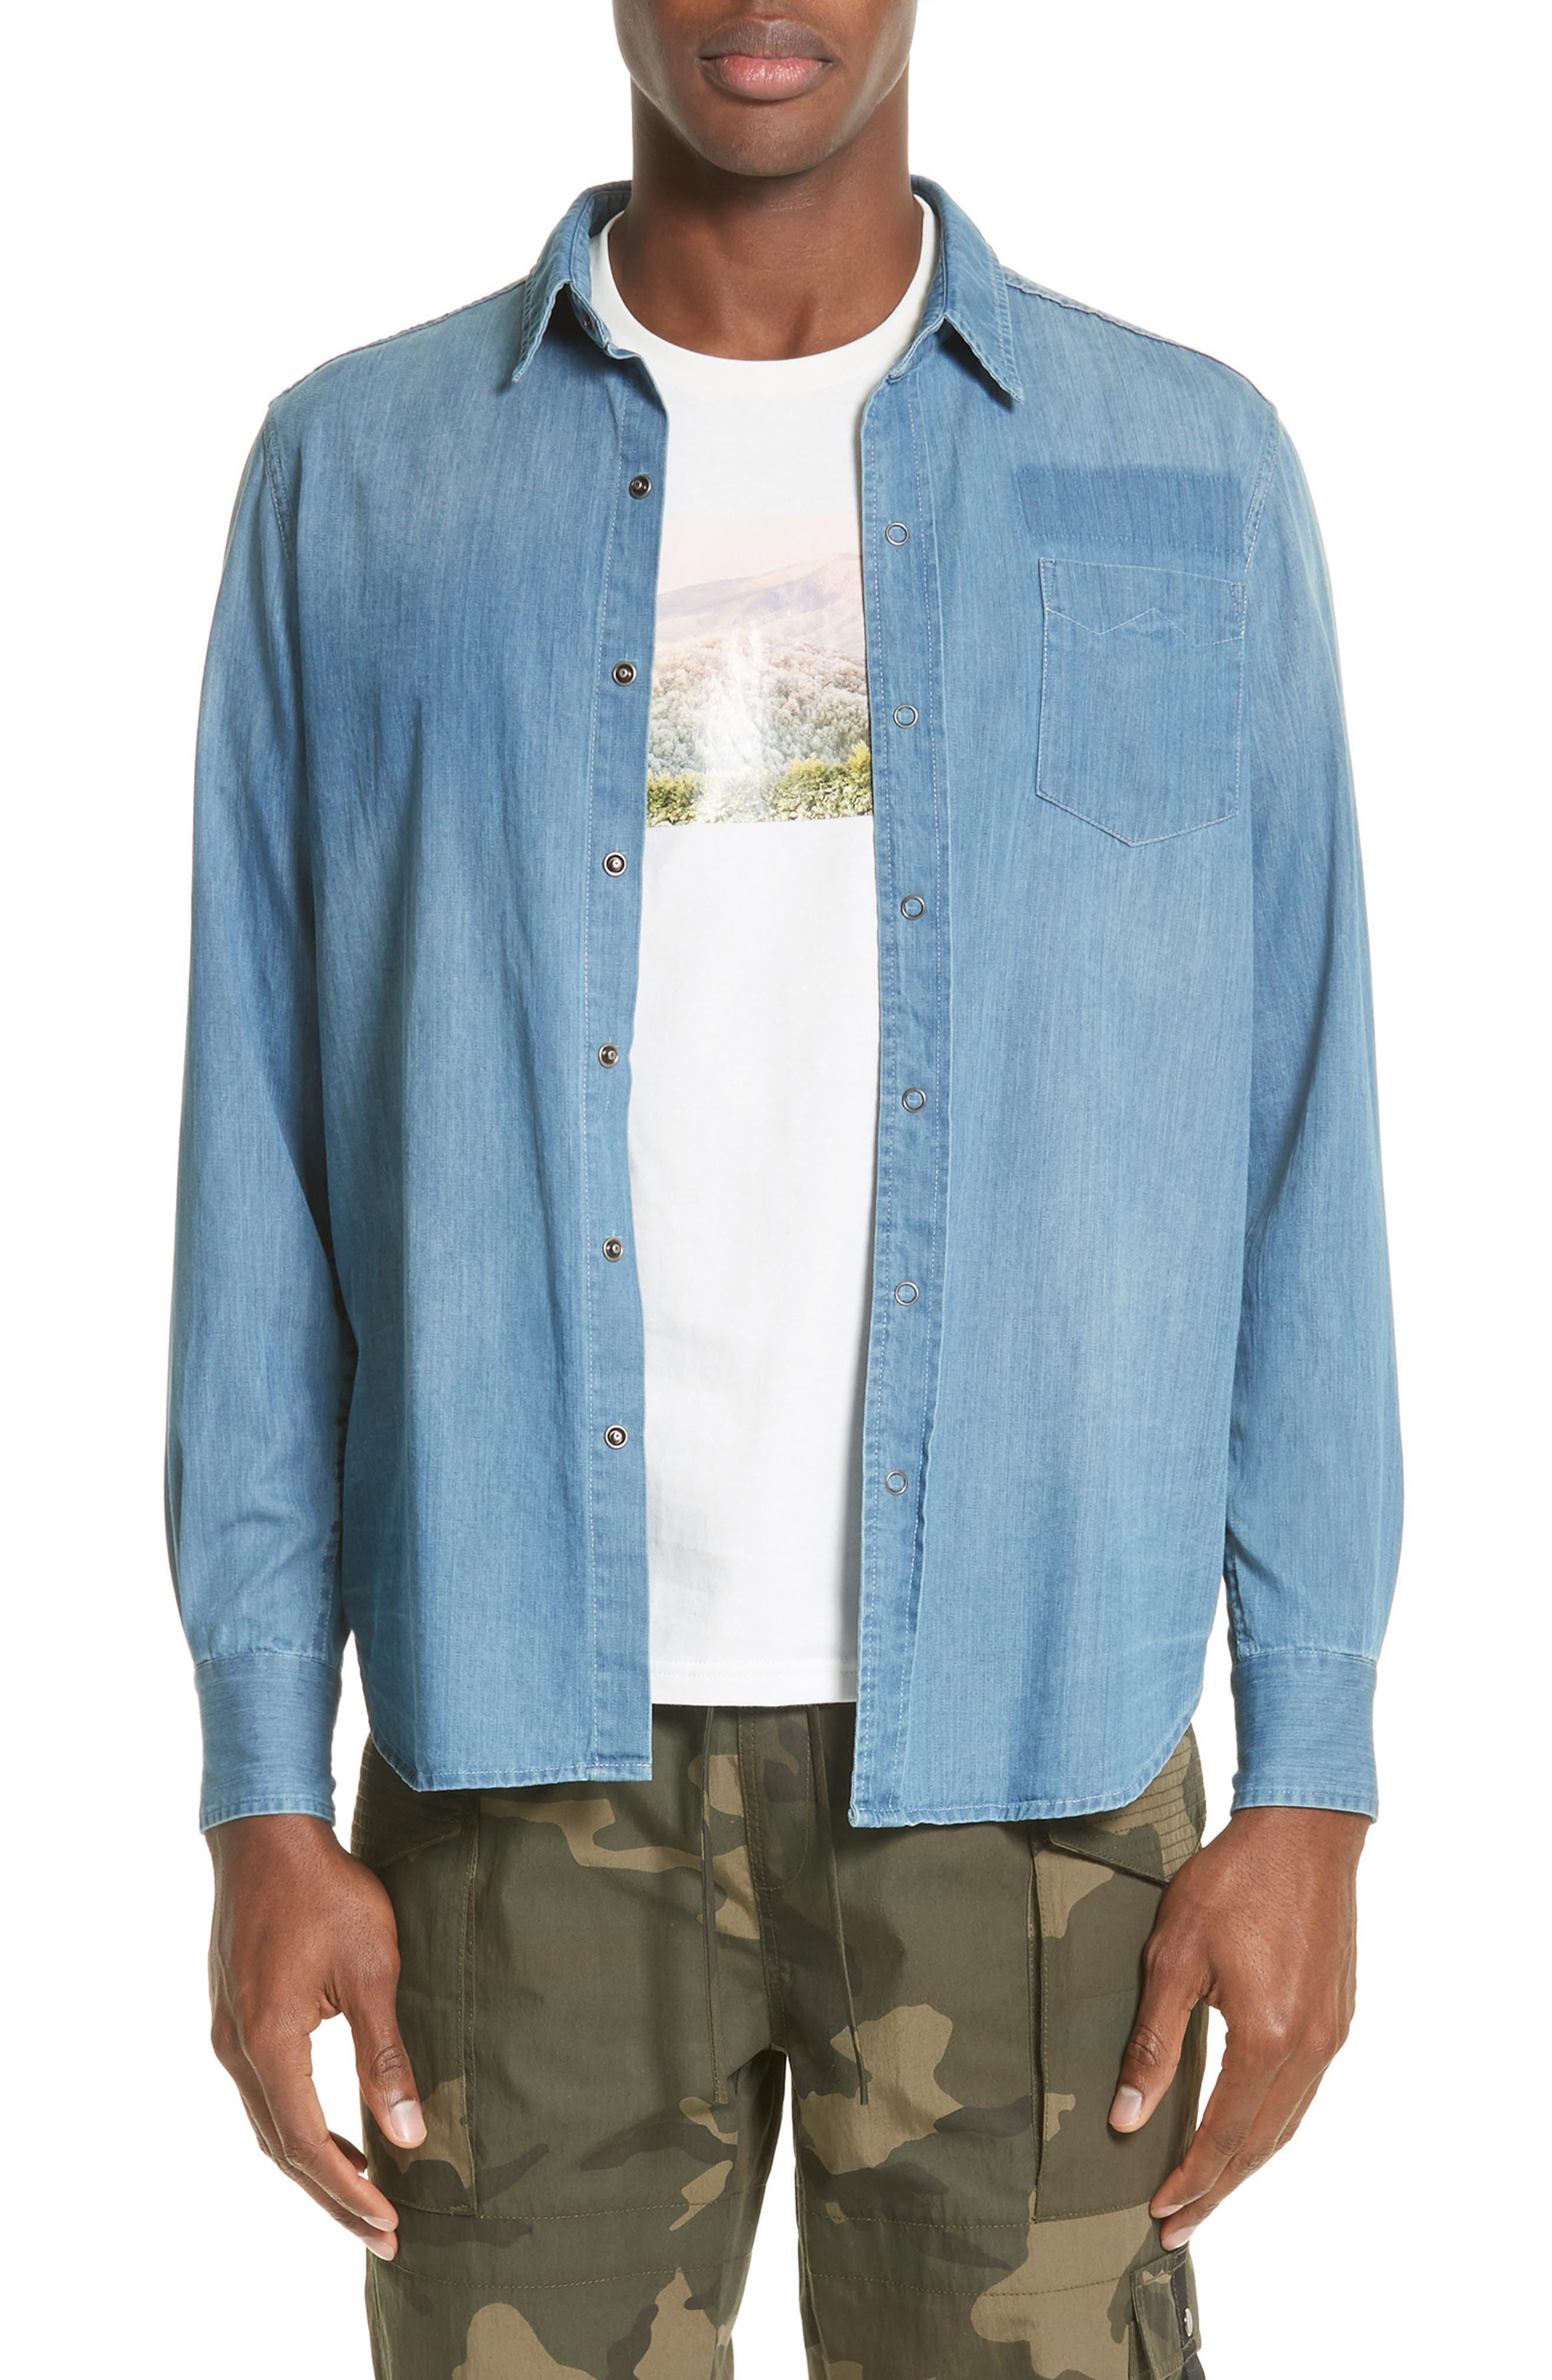 Main Image - OVADIA & SONS Eastern Denim Sport Shirt